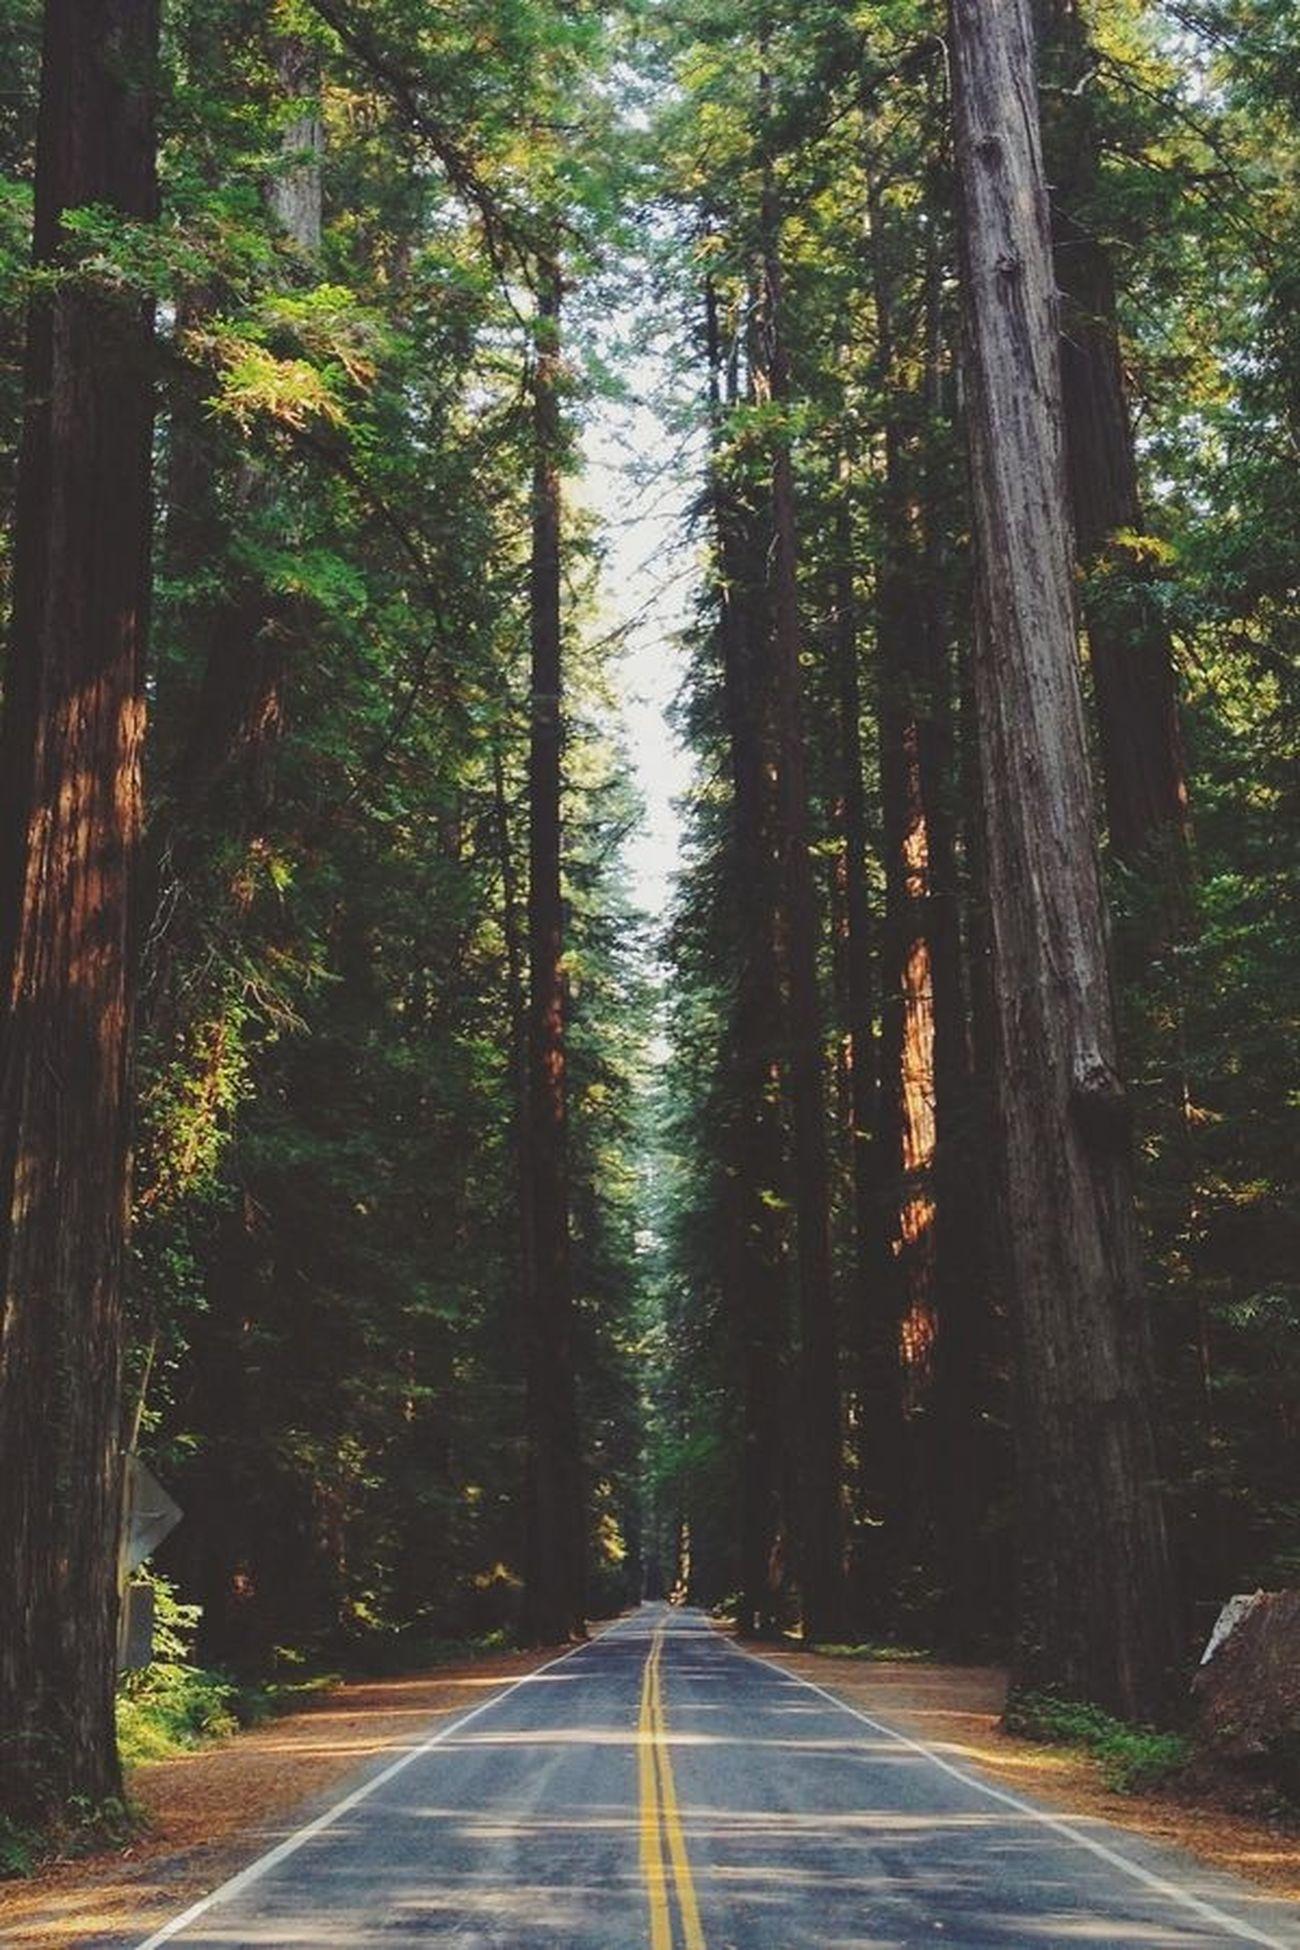 Wanderlust, I am Sights Seeking Adventure Get Lost Space